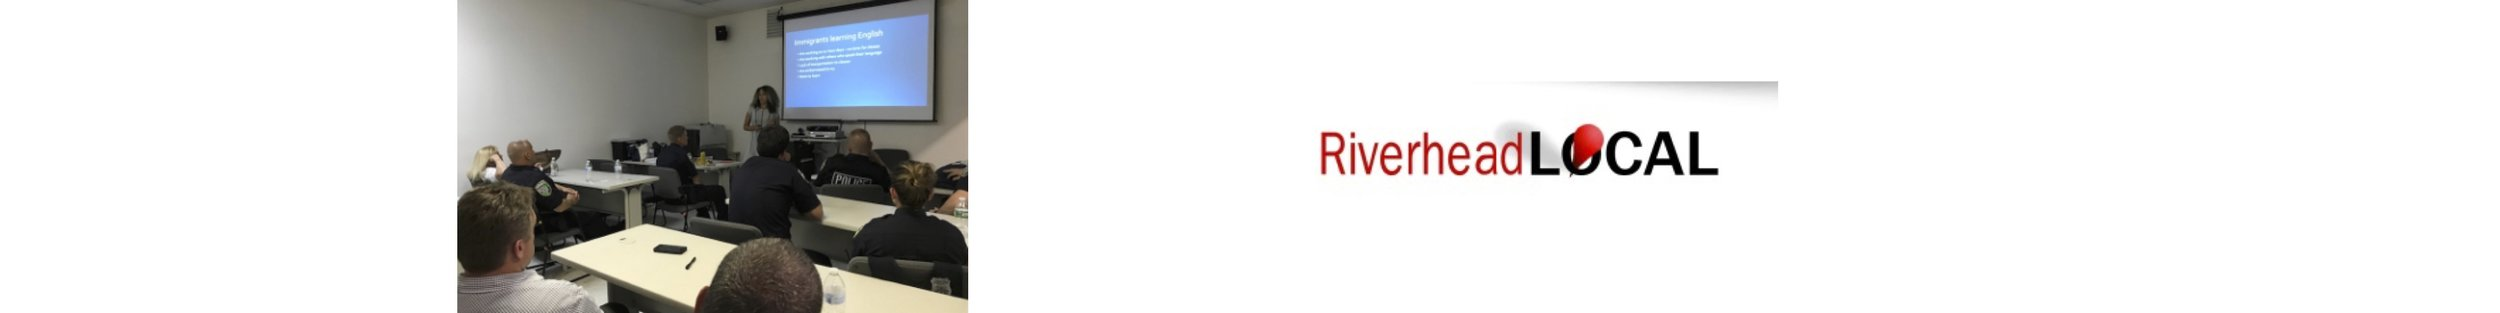 RIVERHEAD LOCAL PRESS 08.2016 copy 2.jpg